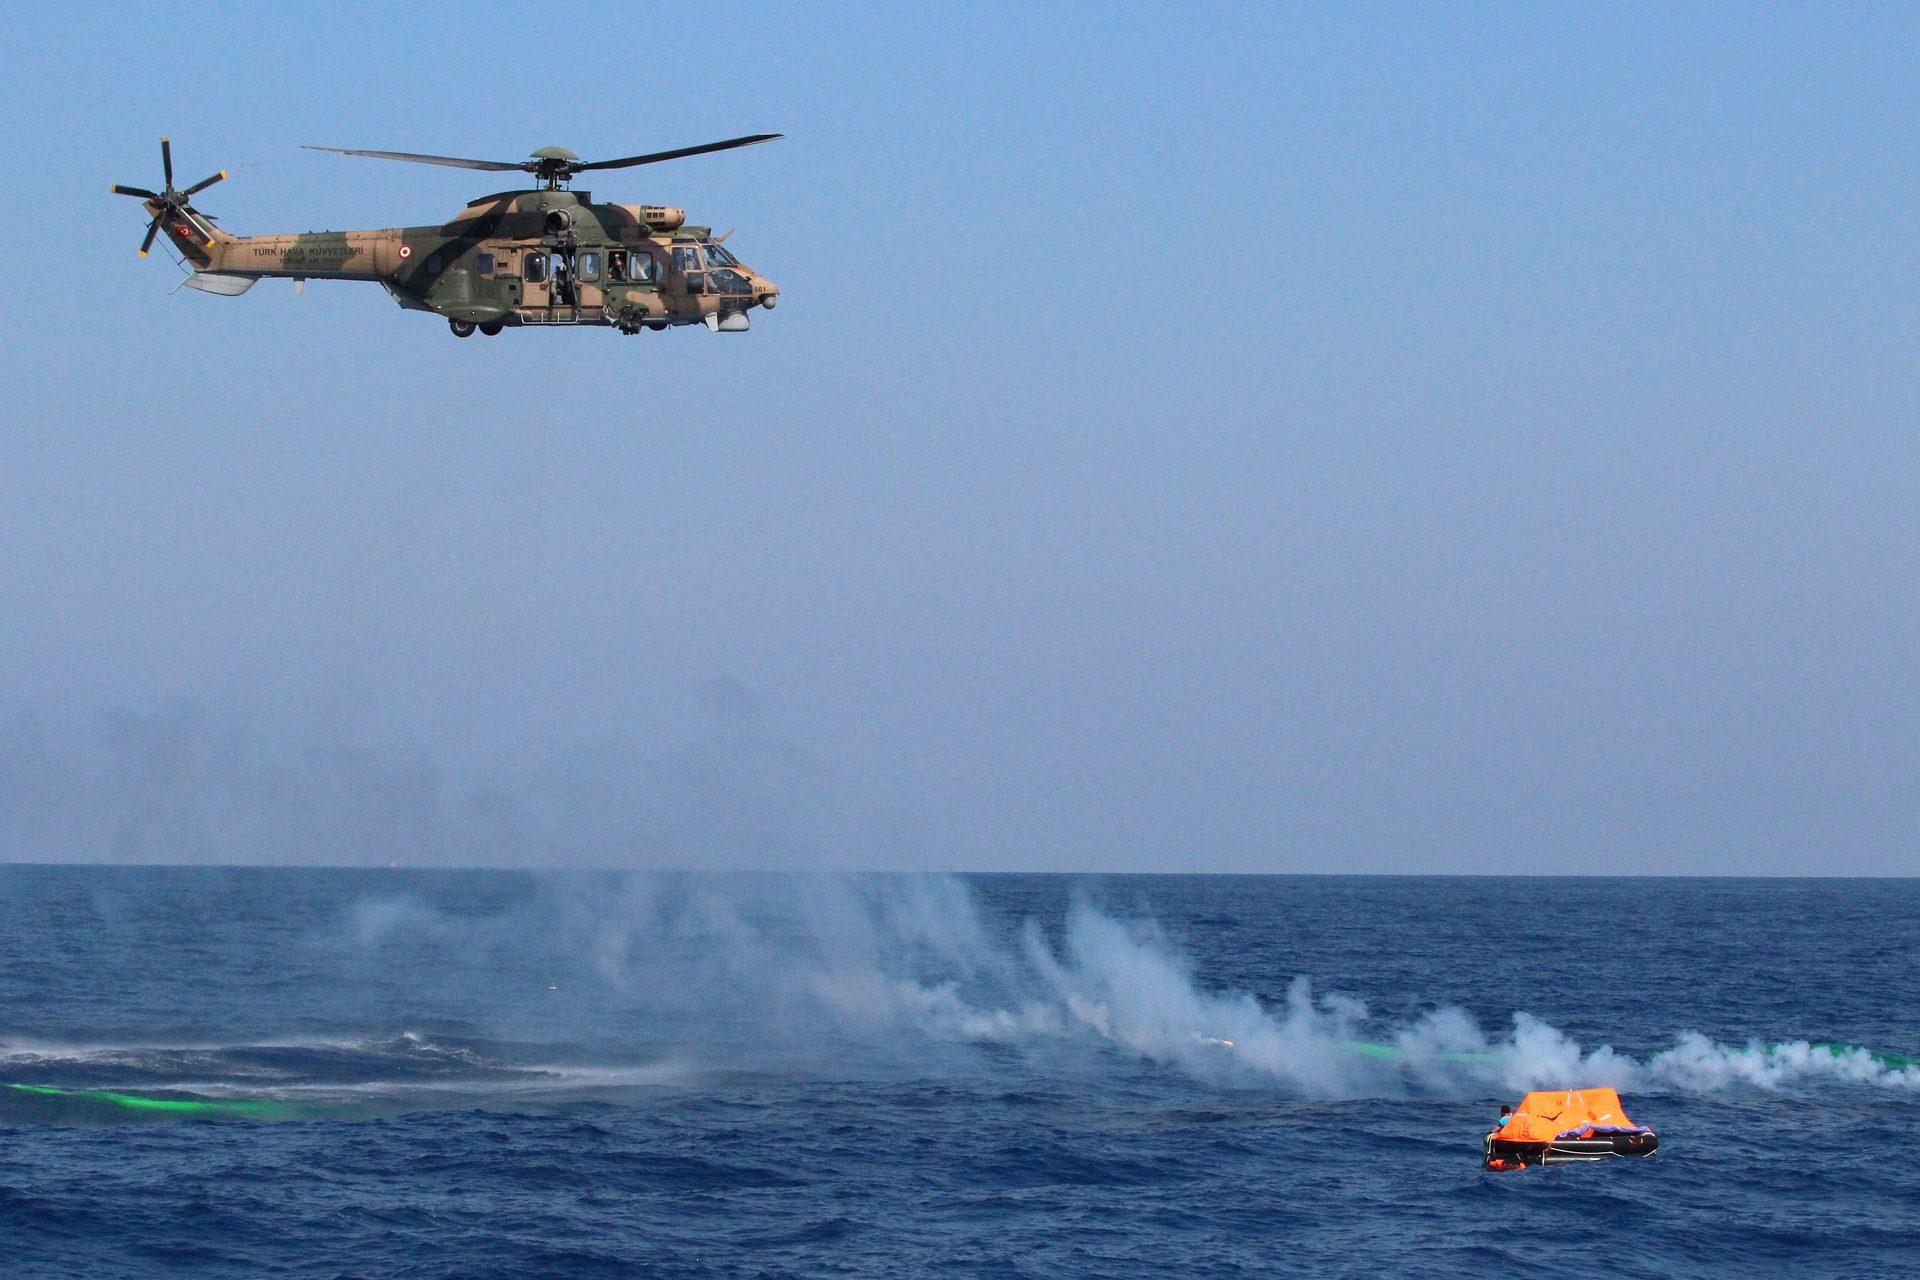 हेलीकाप्टर, salvamento, बचाव, बहाव, सागर - HD वॉलपेपर - प्रोफेसर-falken.com